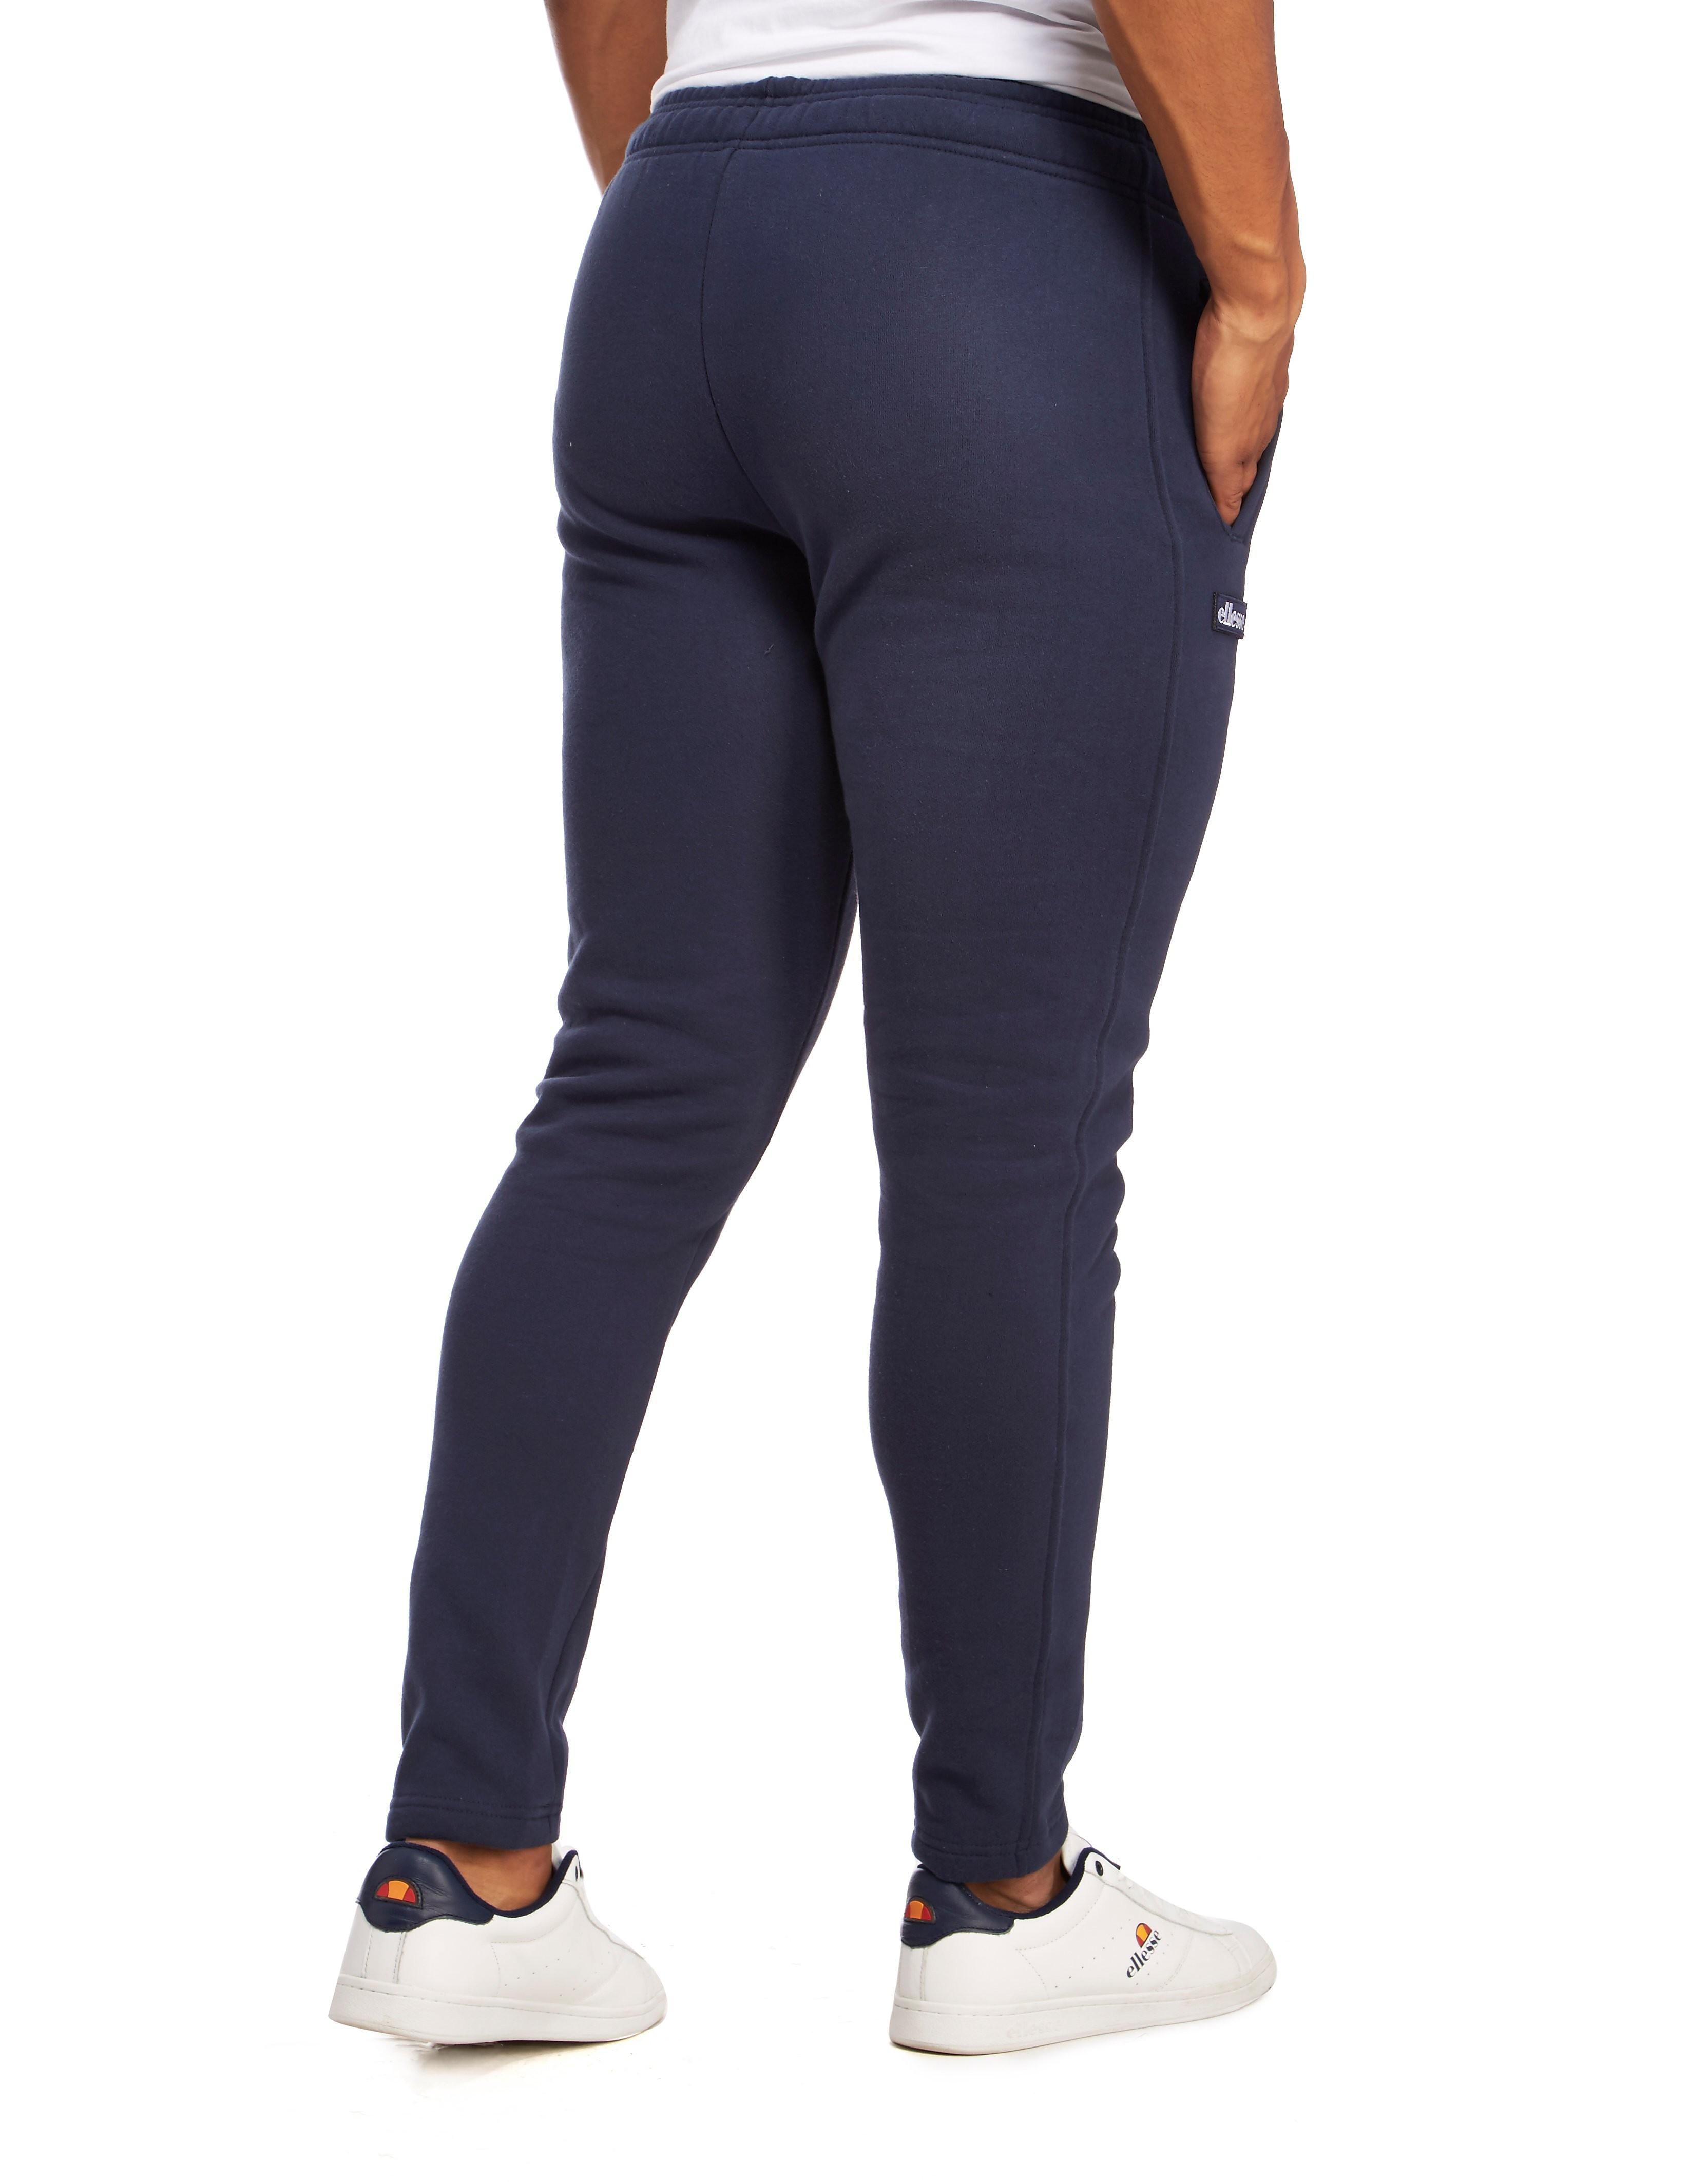 Ellesse Maggiora Track Pants